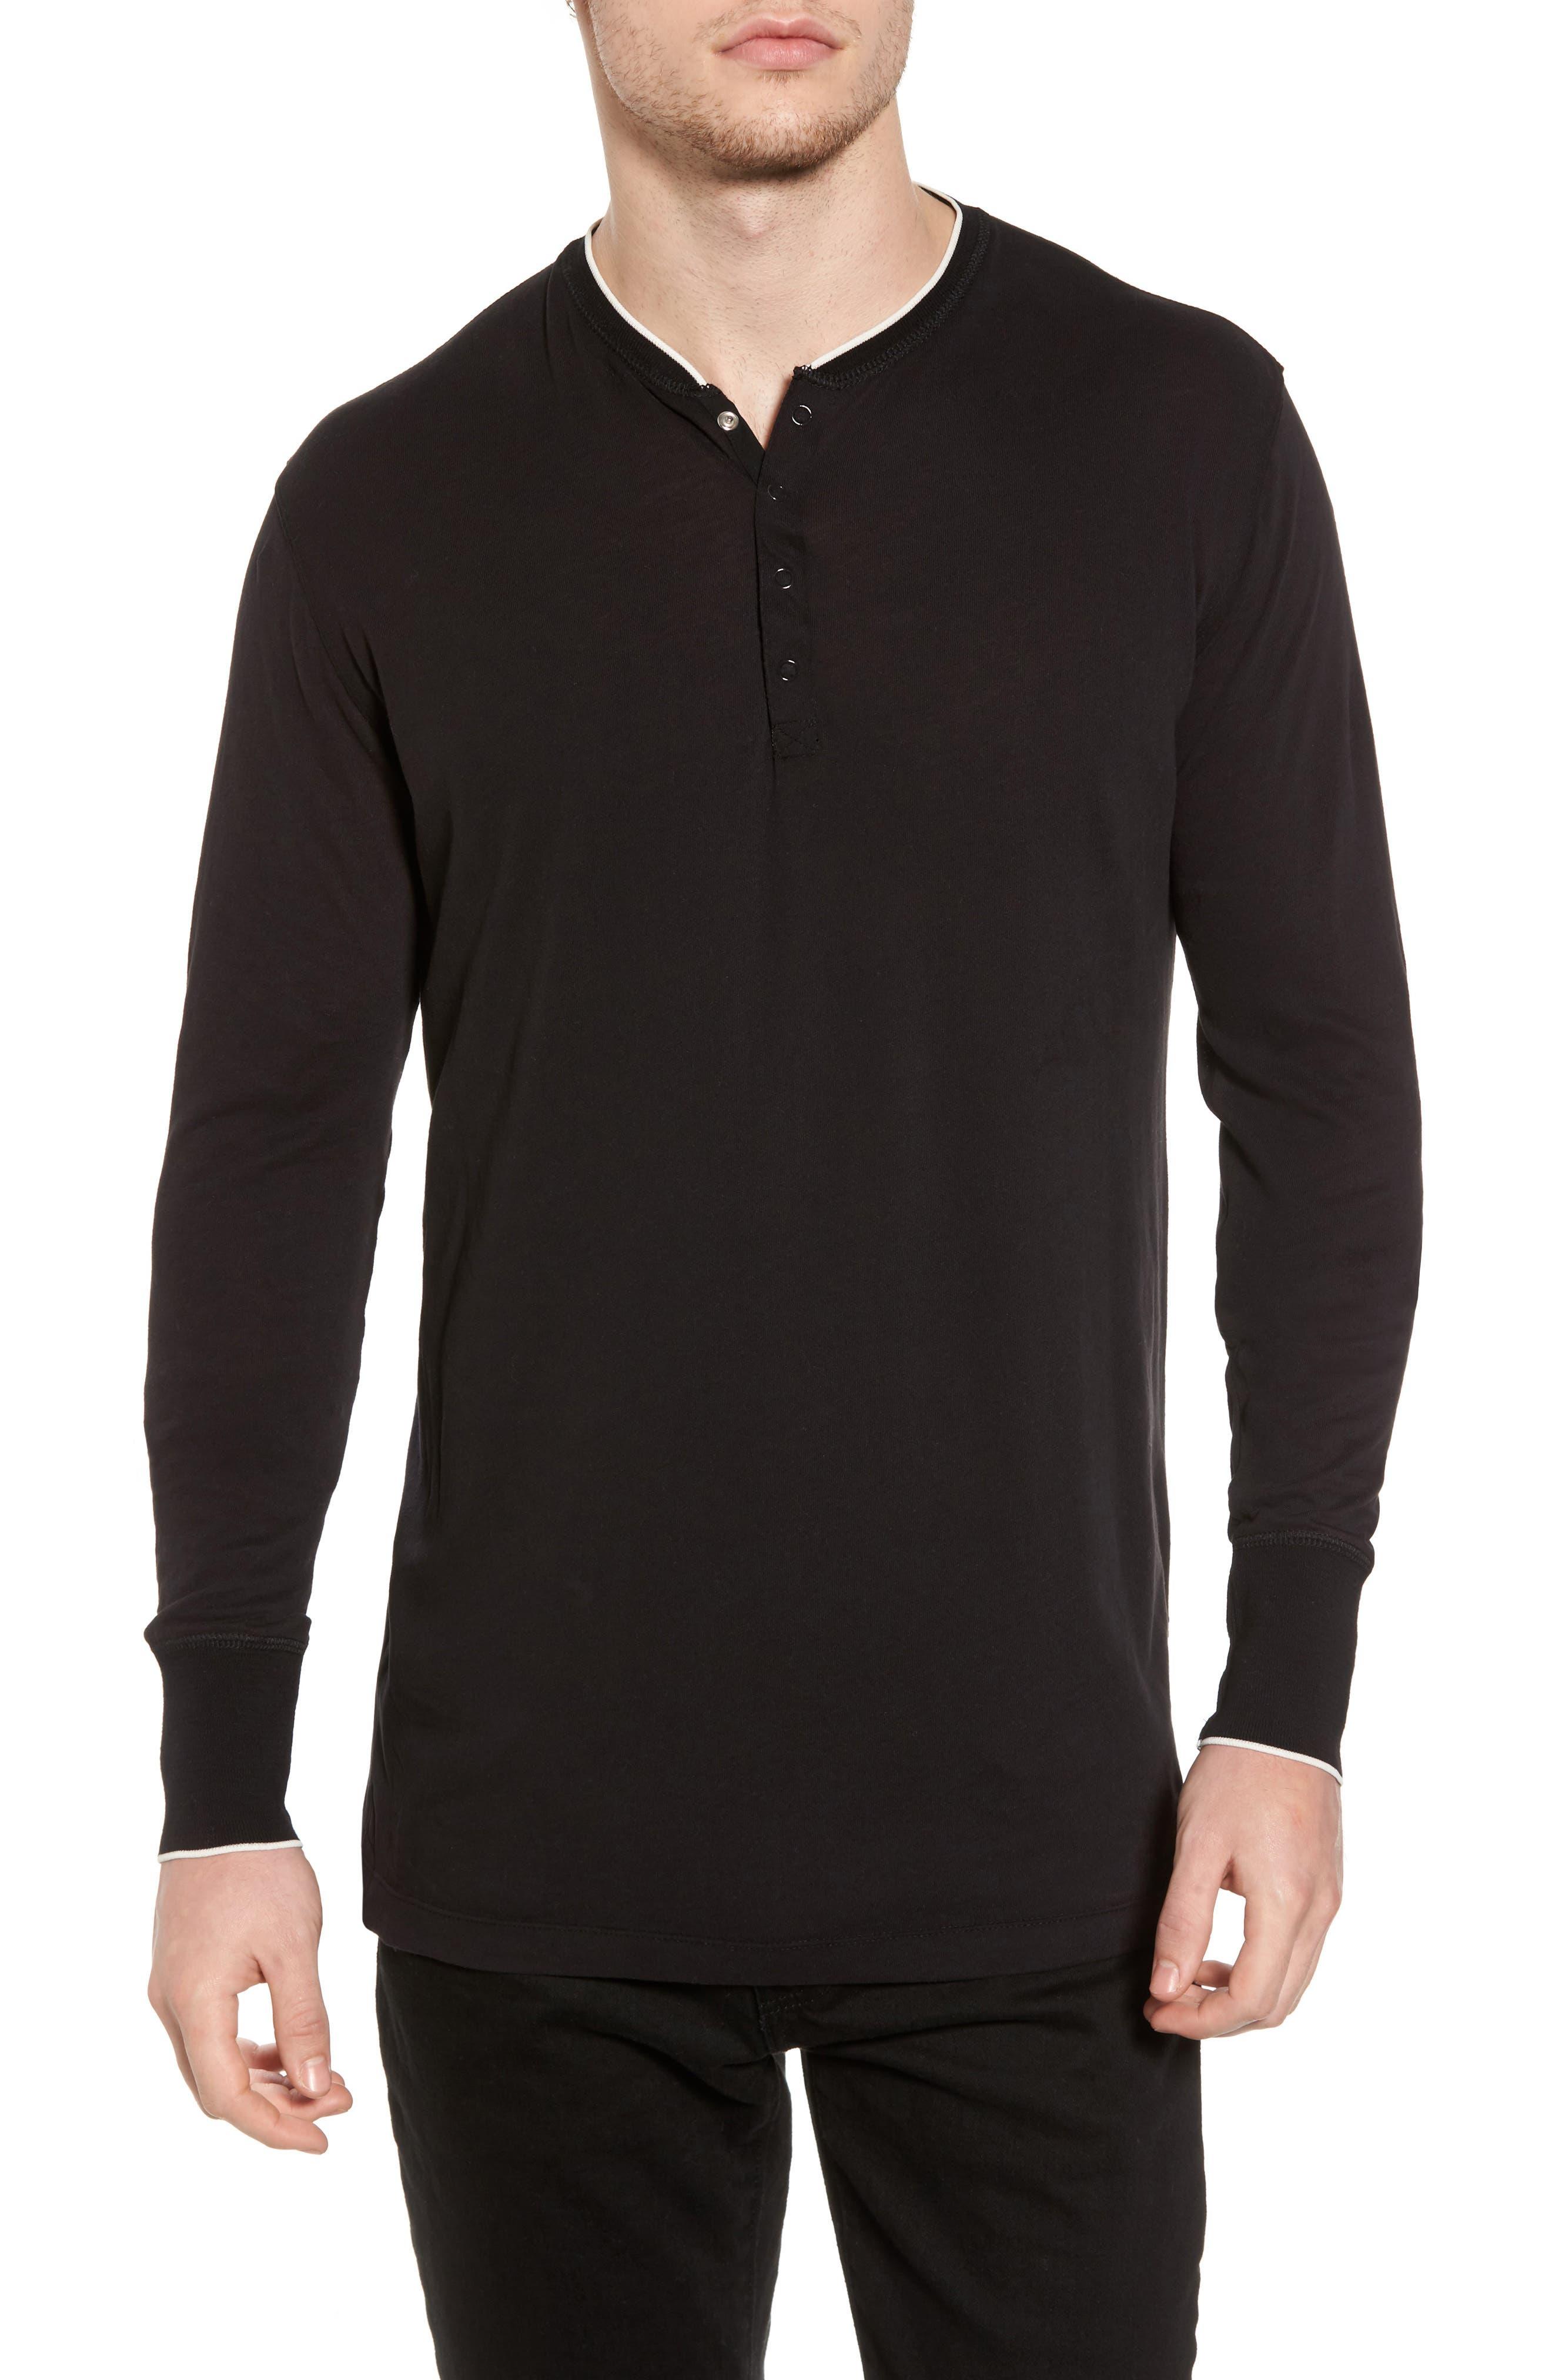 Club Nomade Soft Granddad T-Shirt,                         Main,                         color, Black